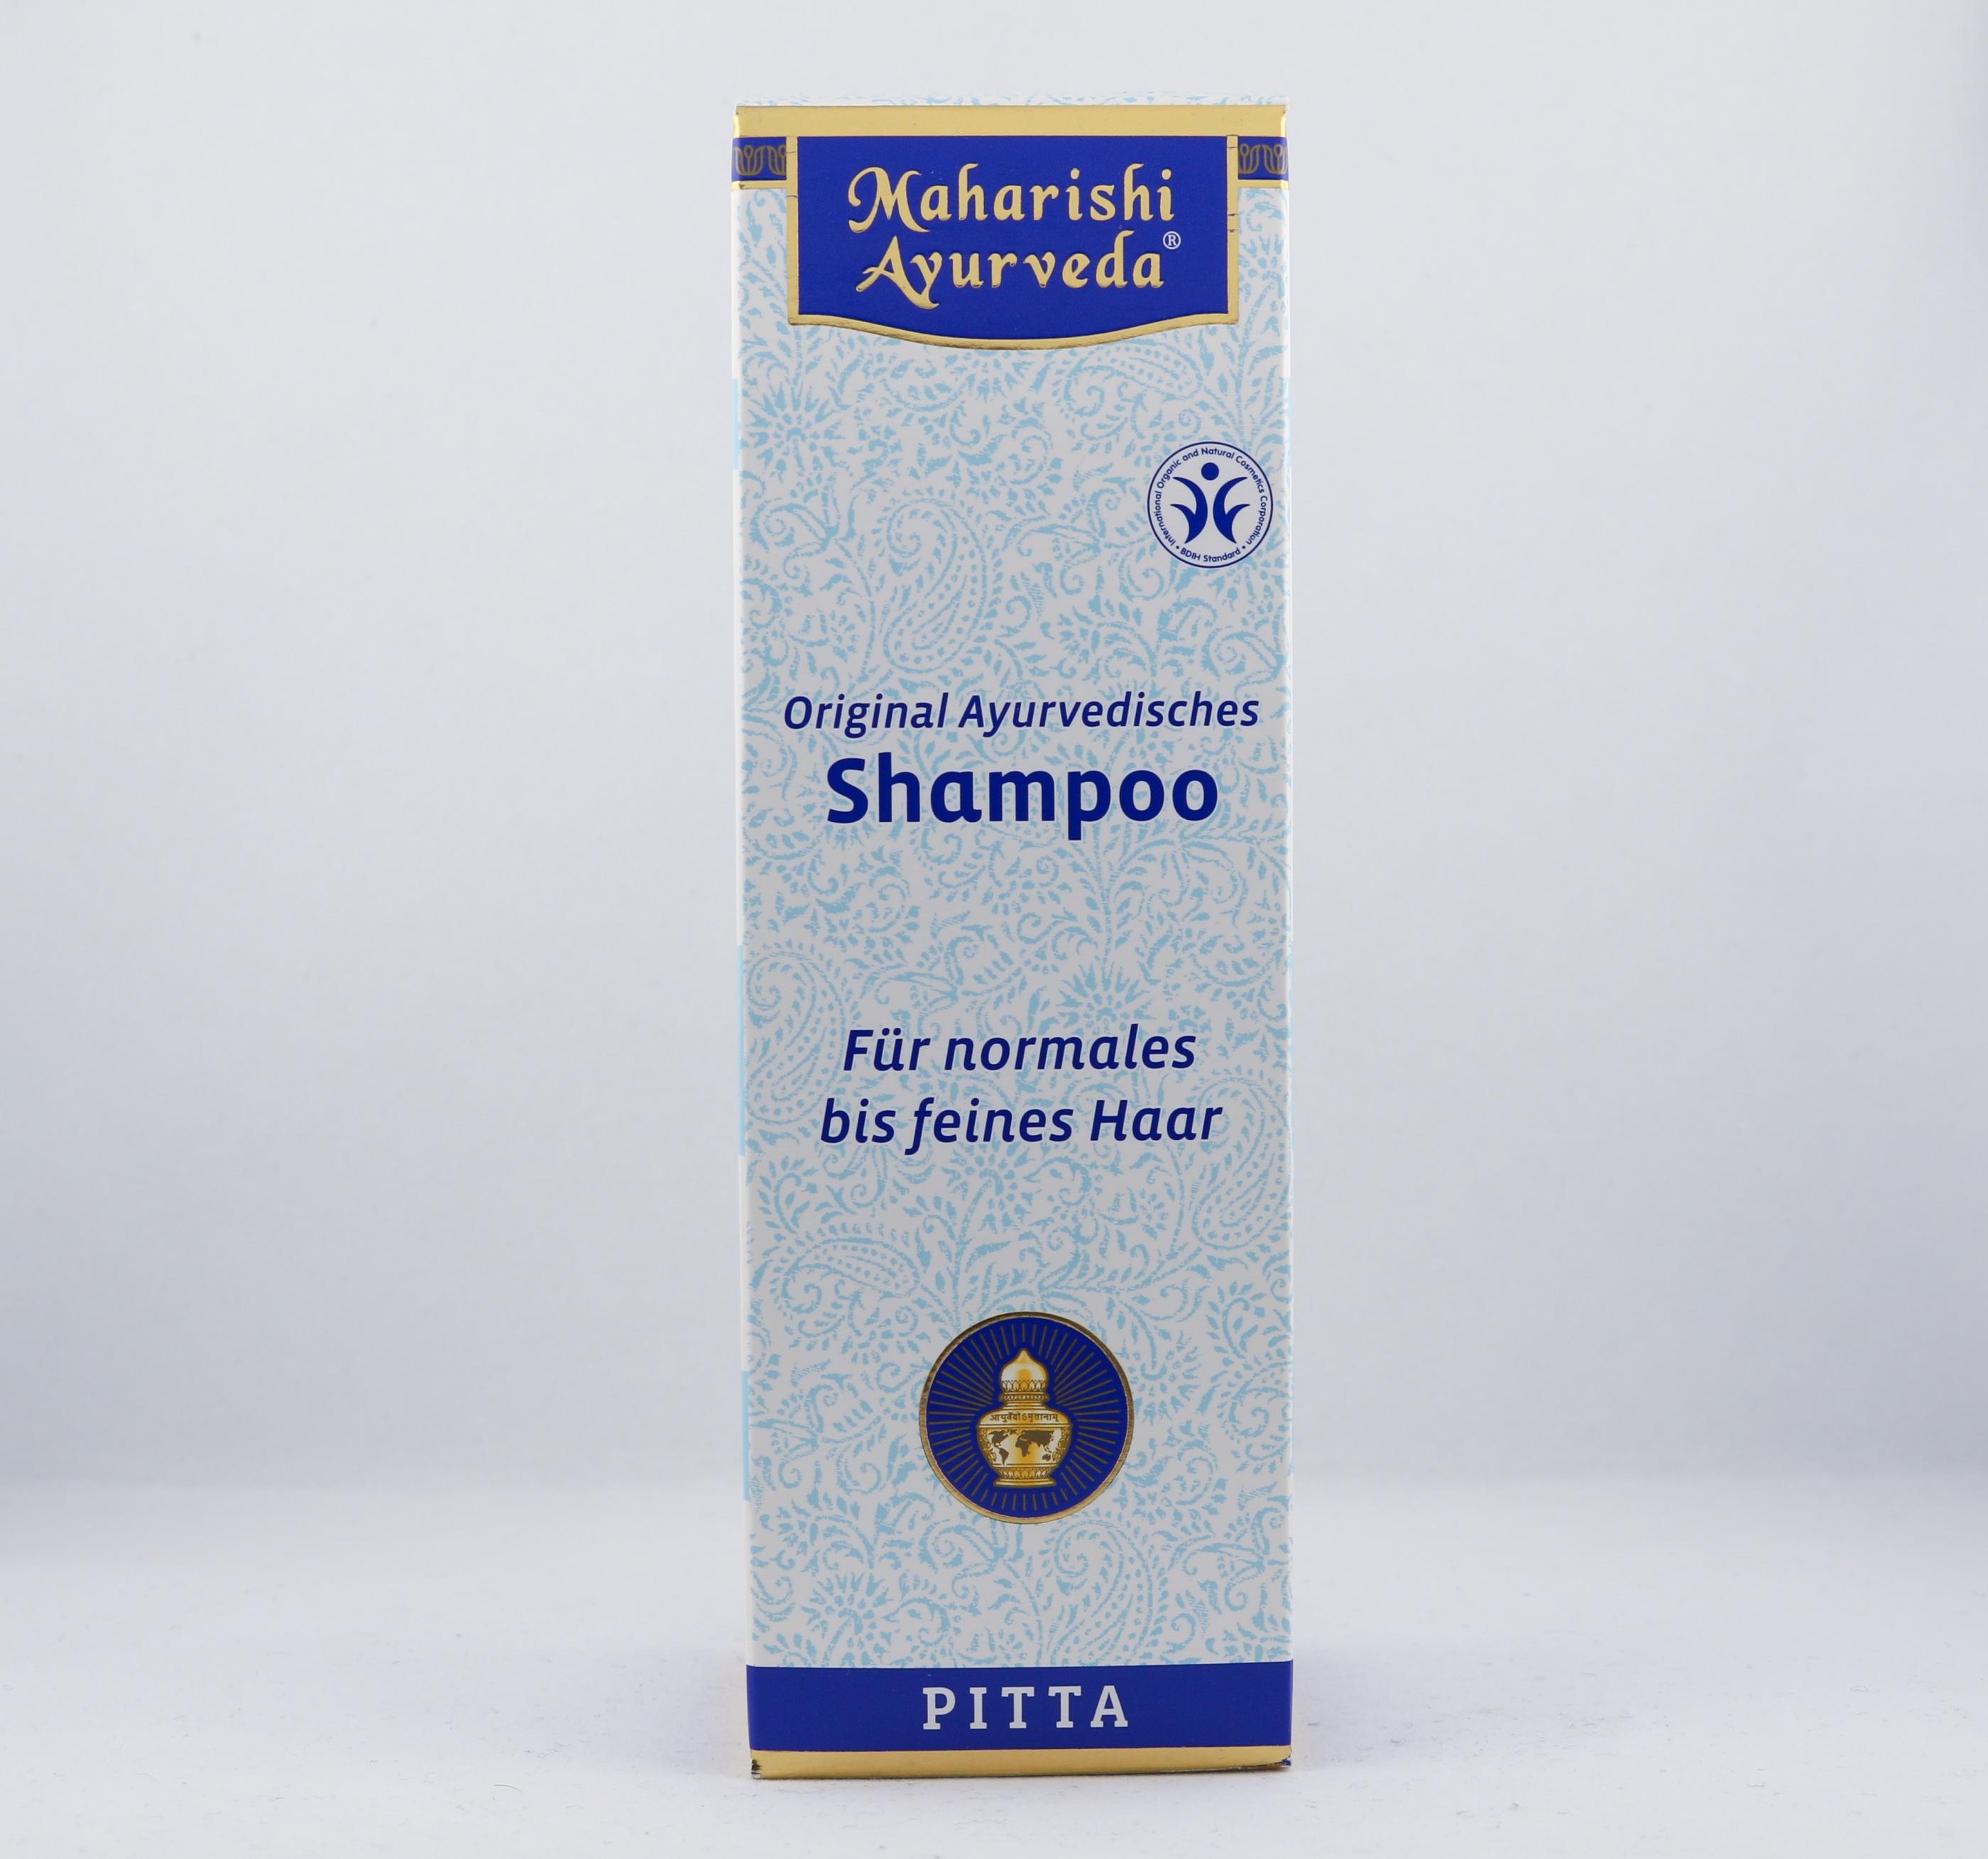 Pitta Schampo wellness ayurveda  halmstad sweden svensk hygien